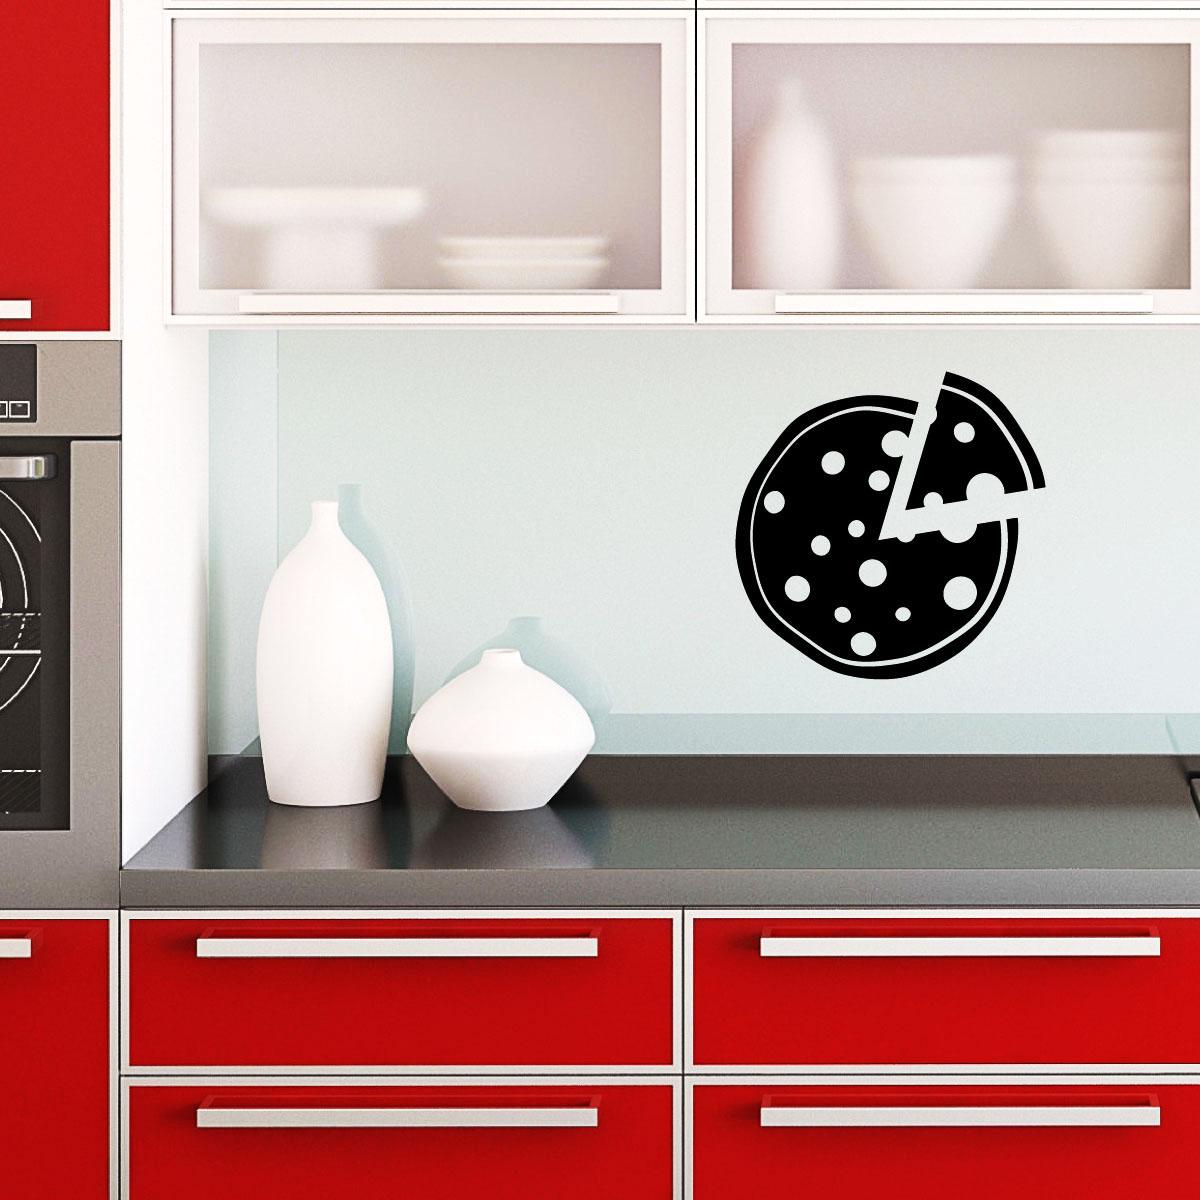 stickers muraux pour la cuisine sticker pizza ambiance. Black Bedroom Furniture Sets. Home Design Ideas